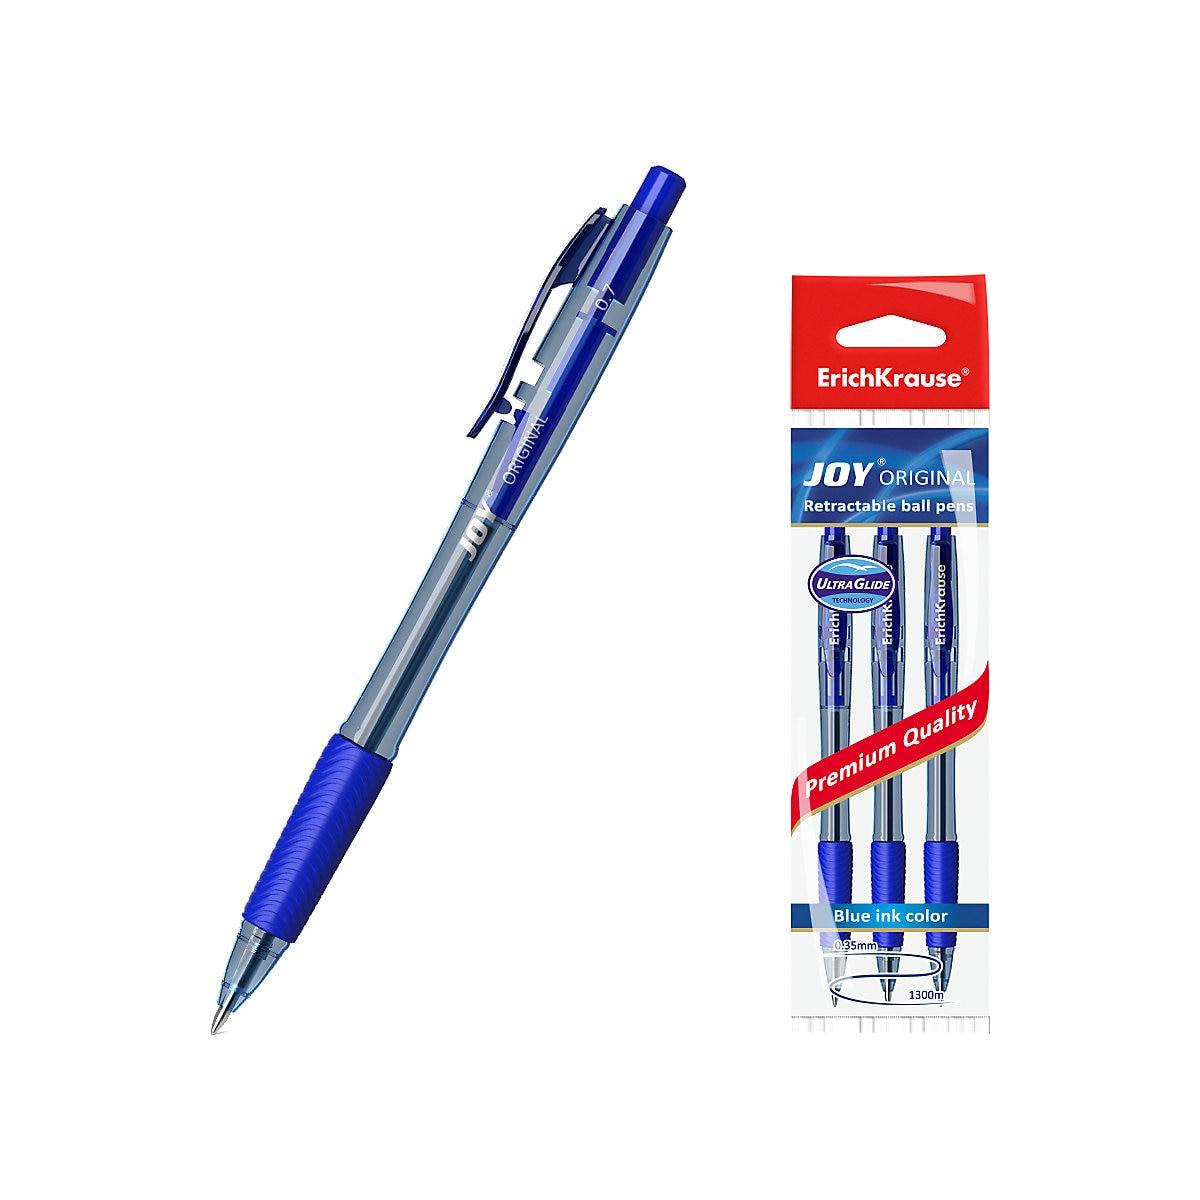 ERICHKRAUSE Pen Grips 11174028 Pens ball the gel pencils writing supplies MTpromo 6pcs ball game props body paint pen